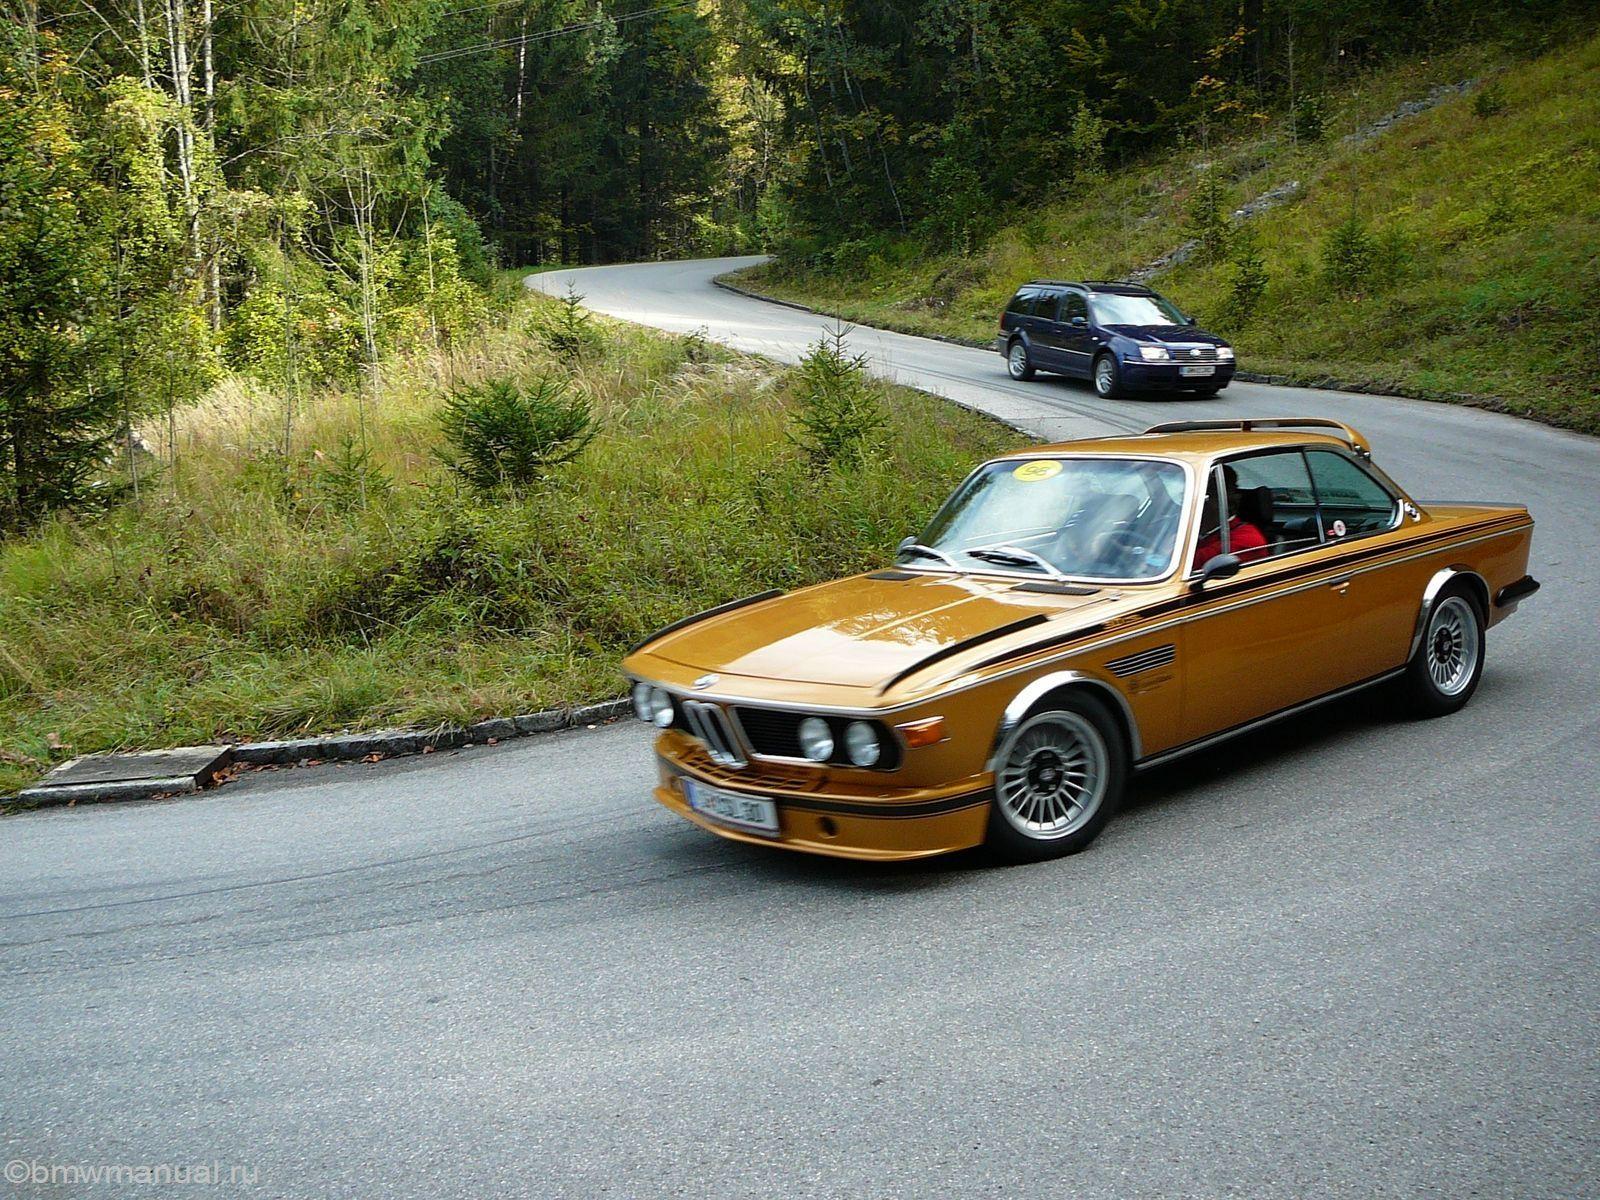 BMW E9 | BMW | Pinterest | Bmw e9, BMW and Cars